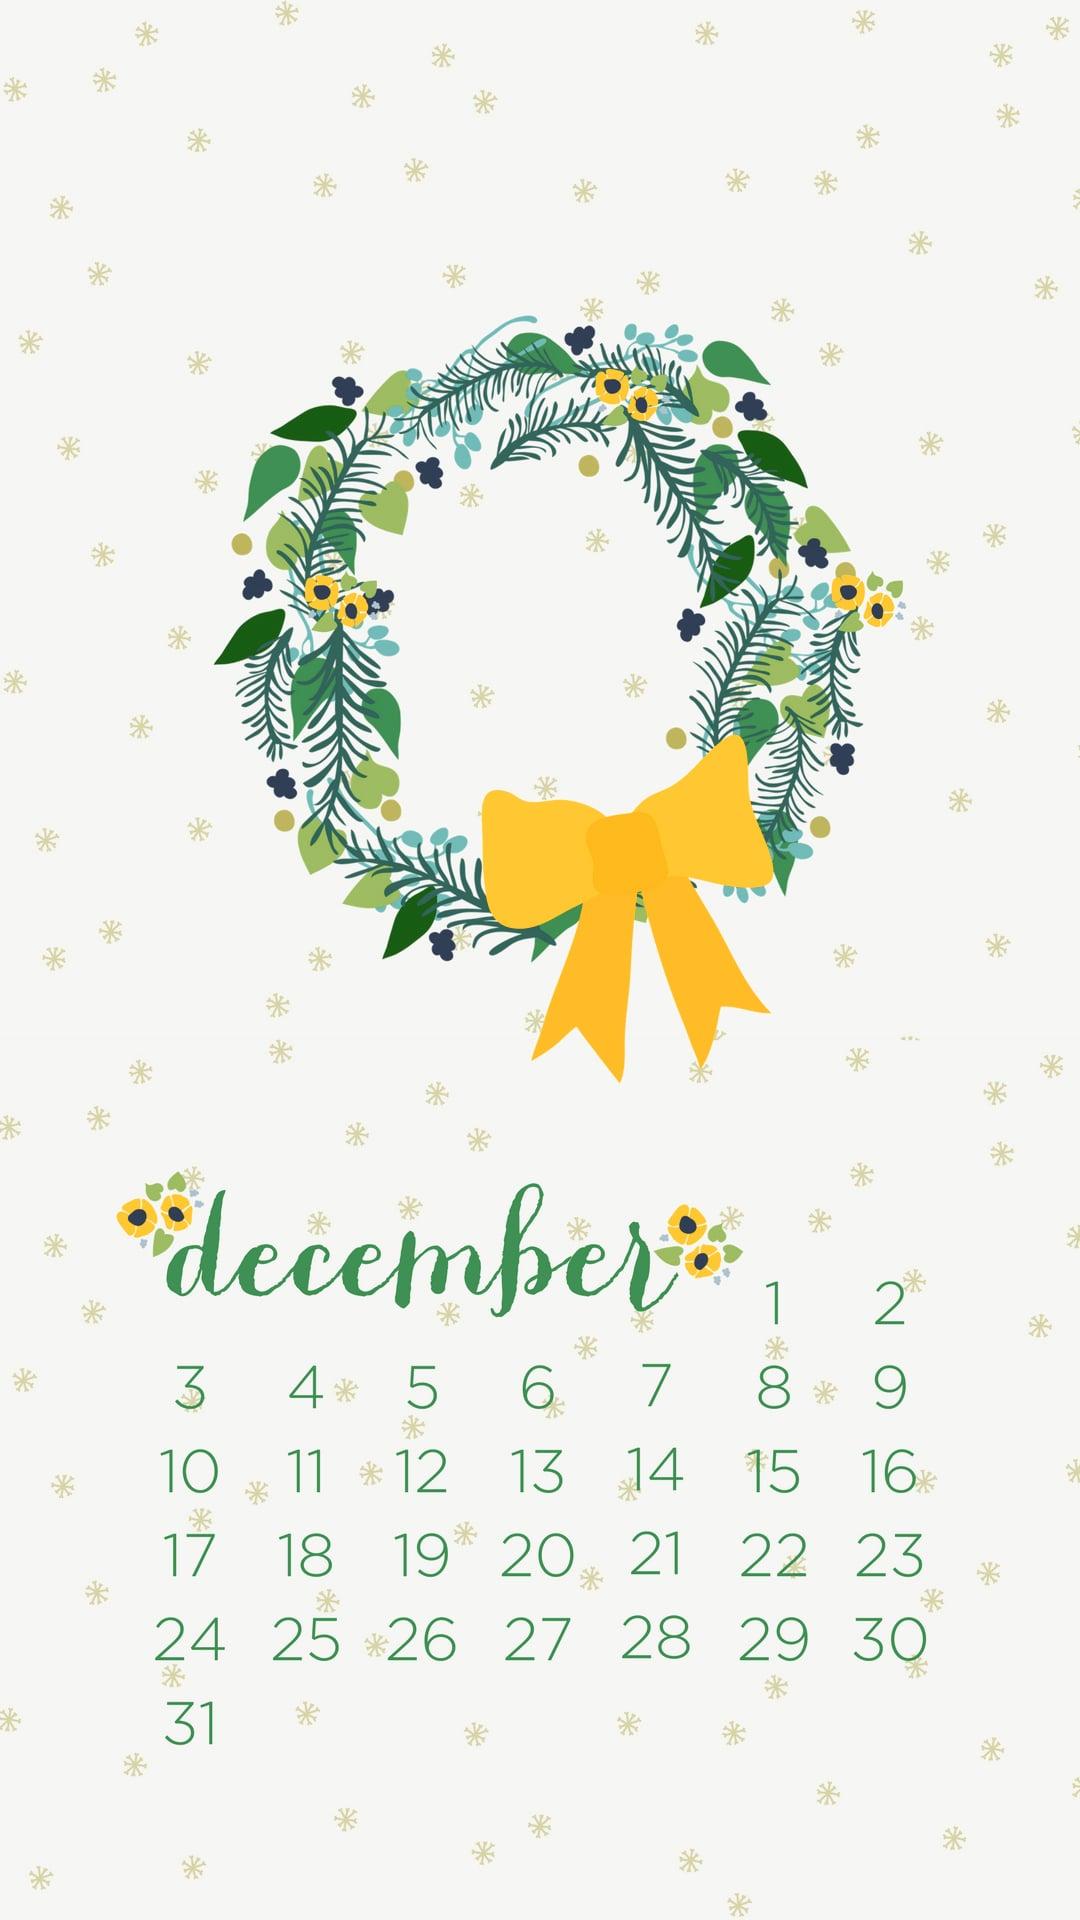 December Calendar Wallpaper 2020   KoLPaPer   Awesome HD 1080x1920